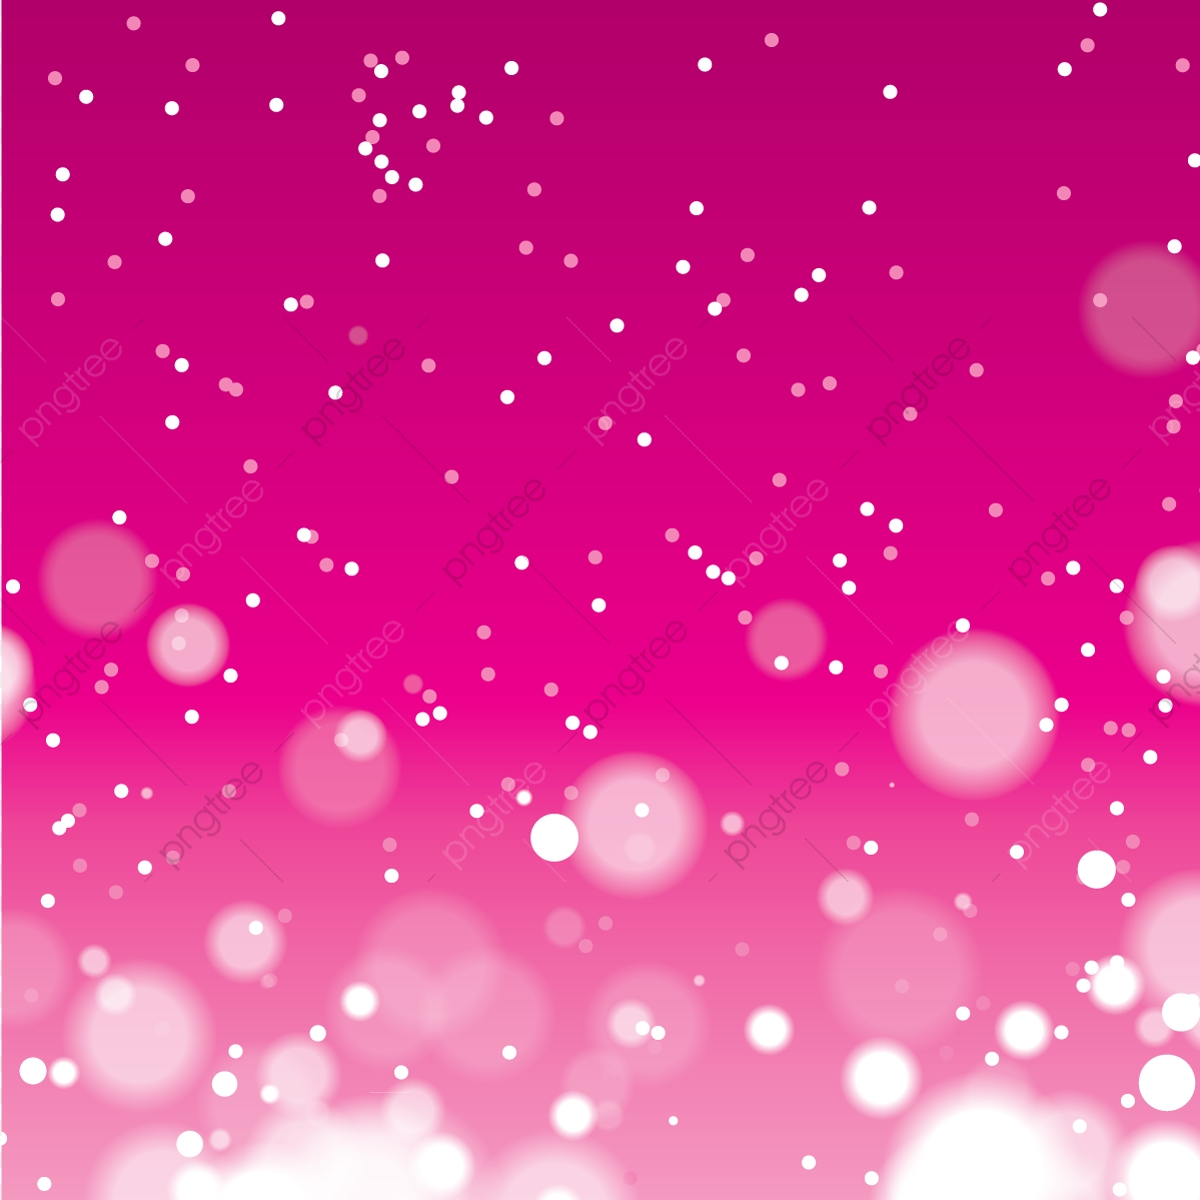 Pink Light Abstract Background Vector, Pink, Light, Bokeh